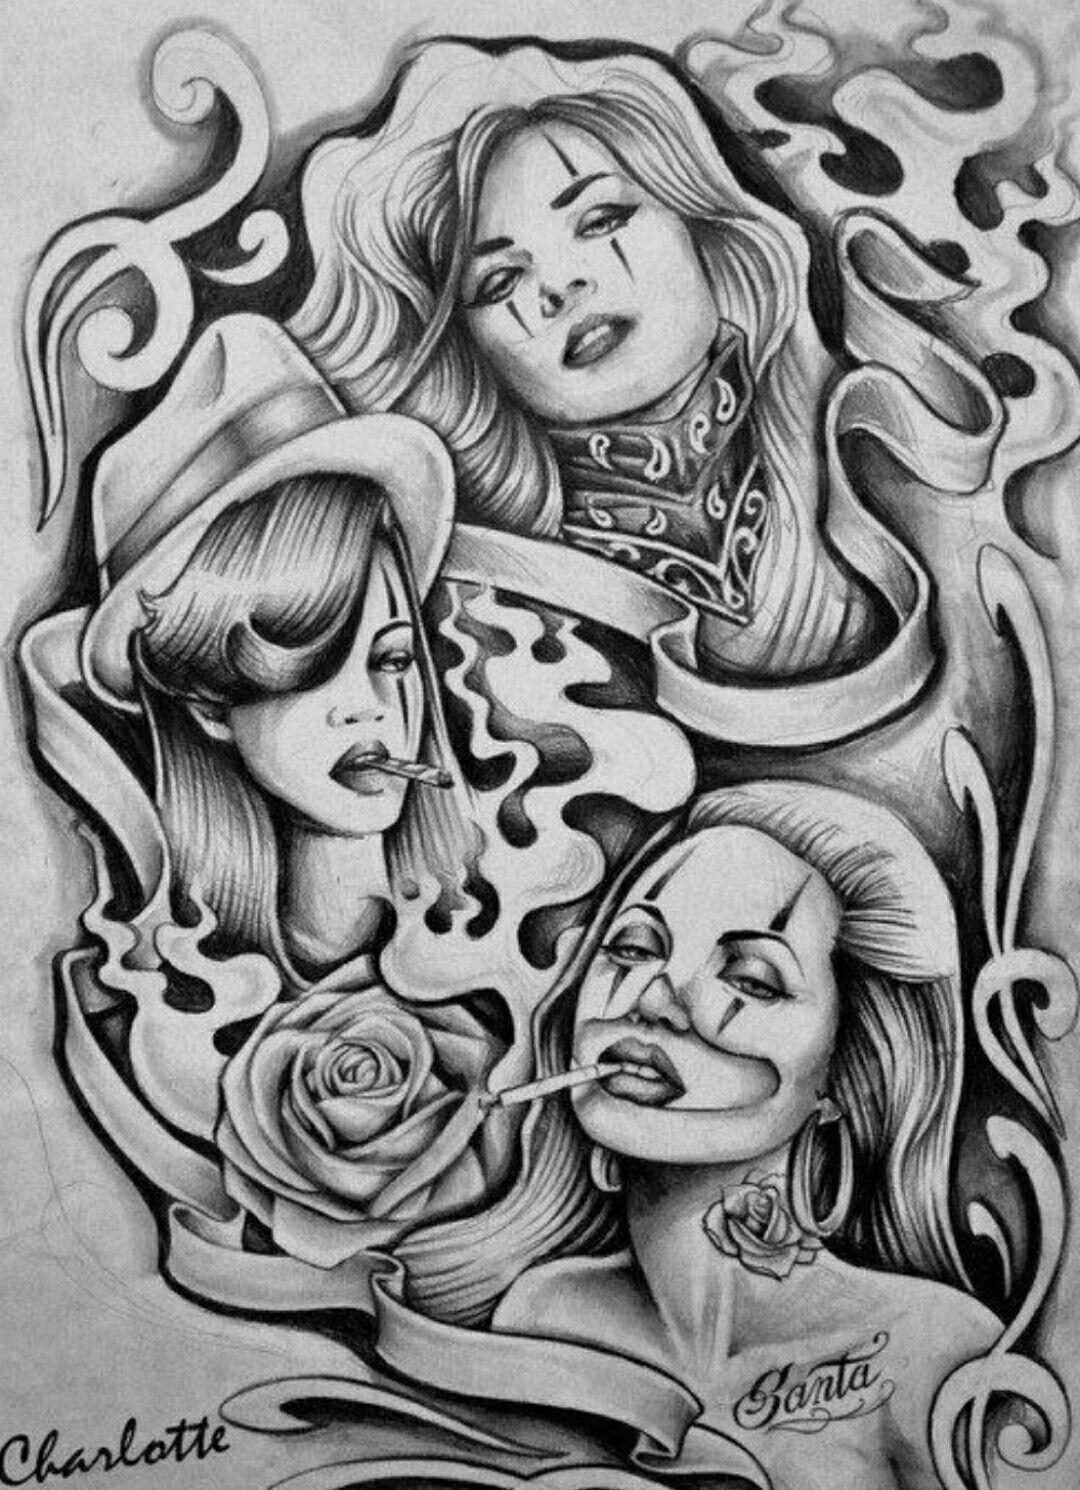 Pin by Big Burg on Chicano Arte   Chicano drawings, Cholo ...